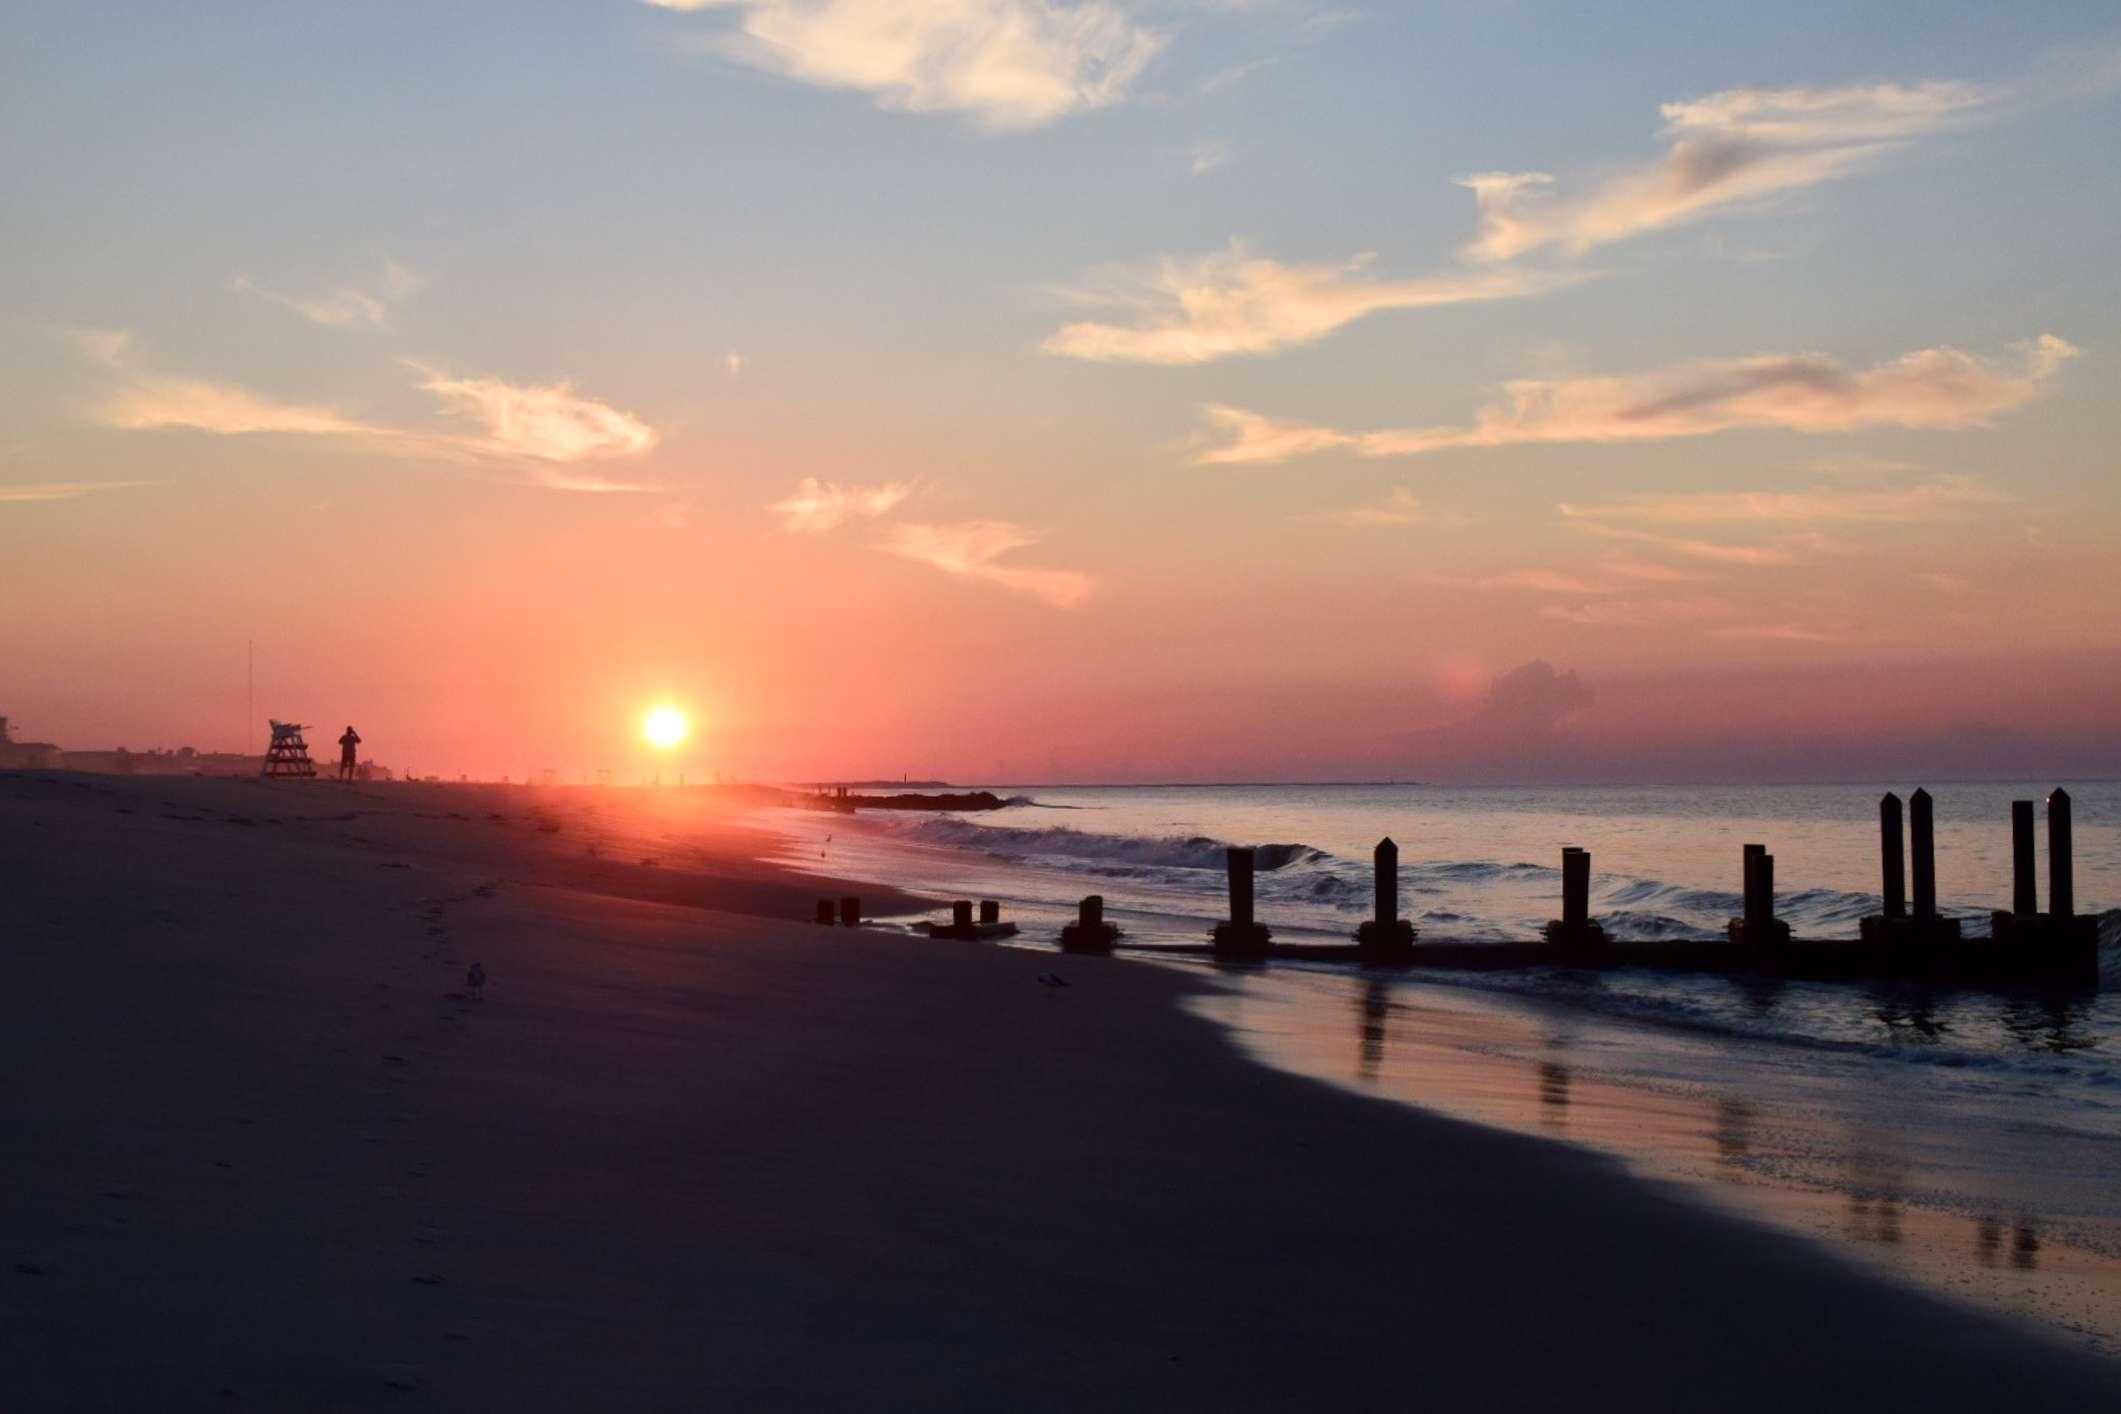 Cape May beach at sunset